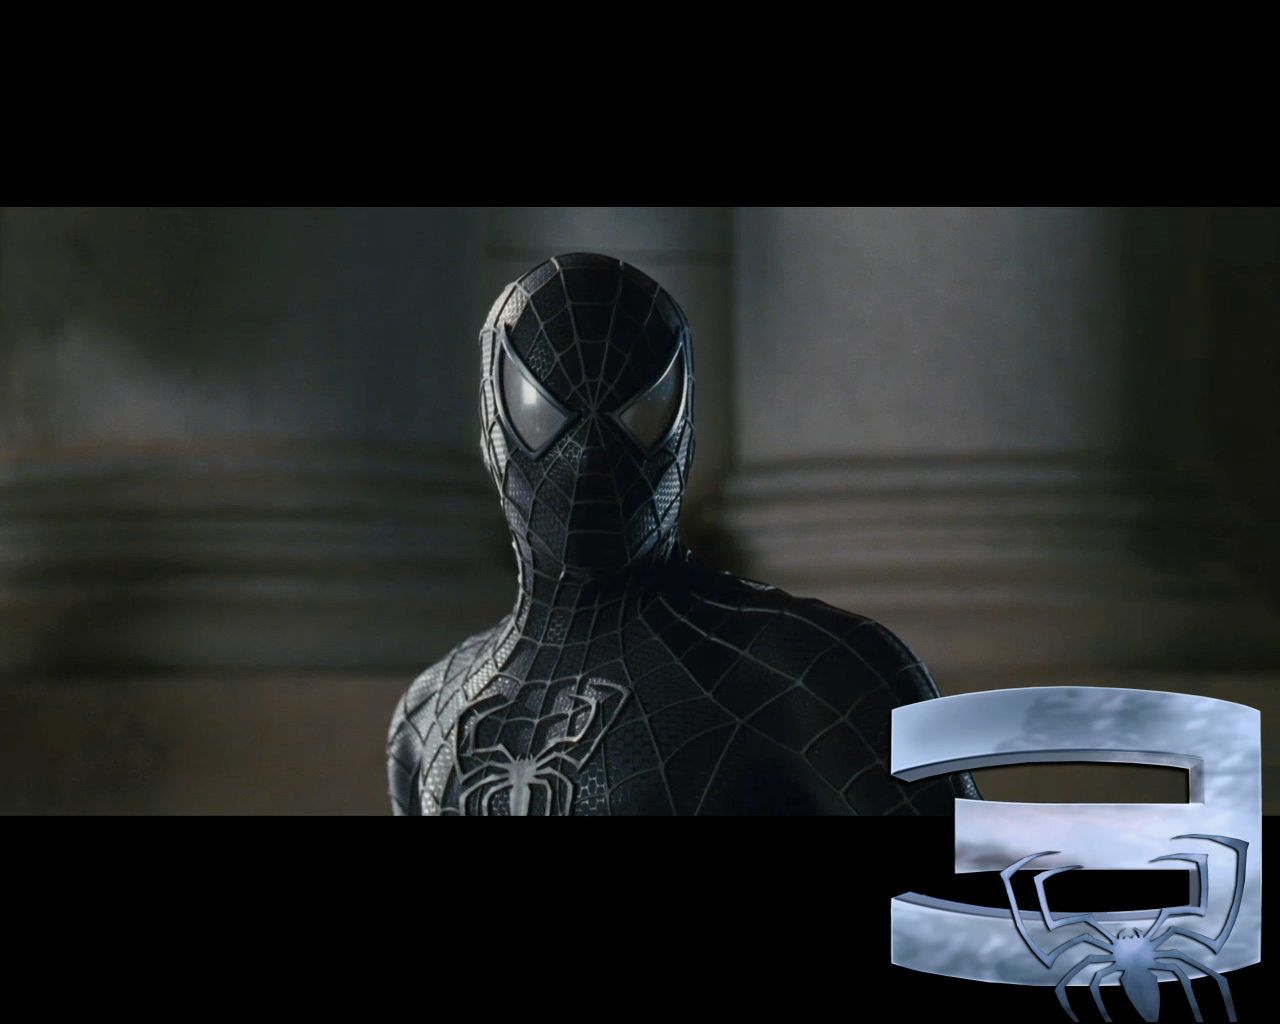 Spiderman 3 wallpaper spiderman 3